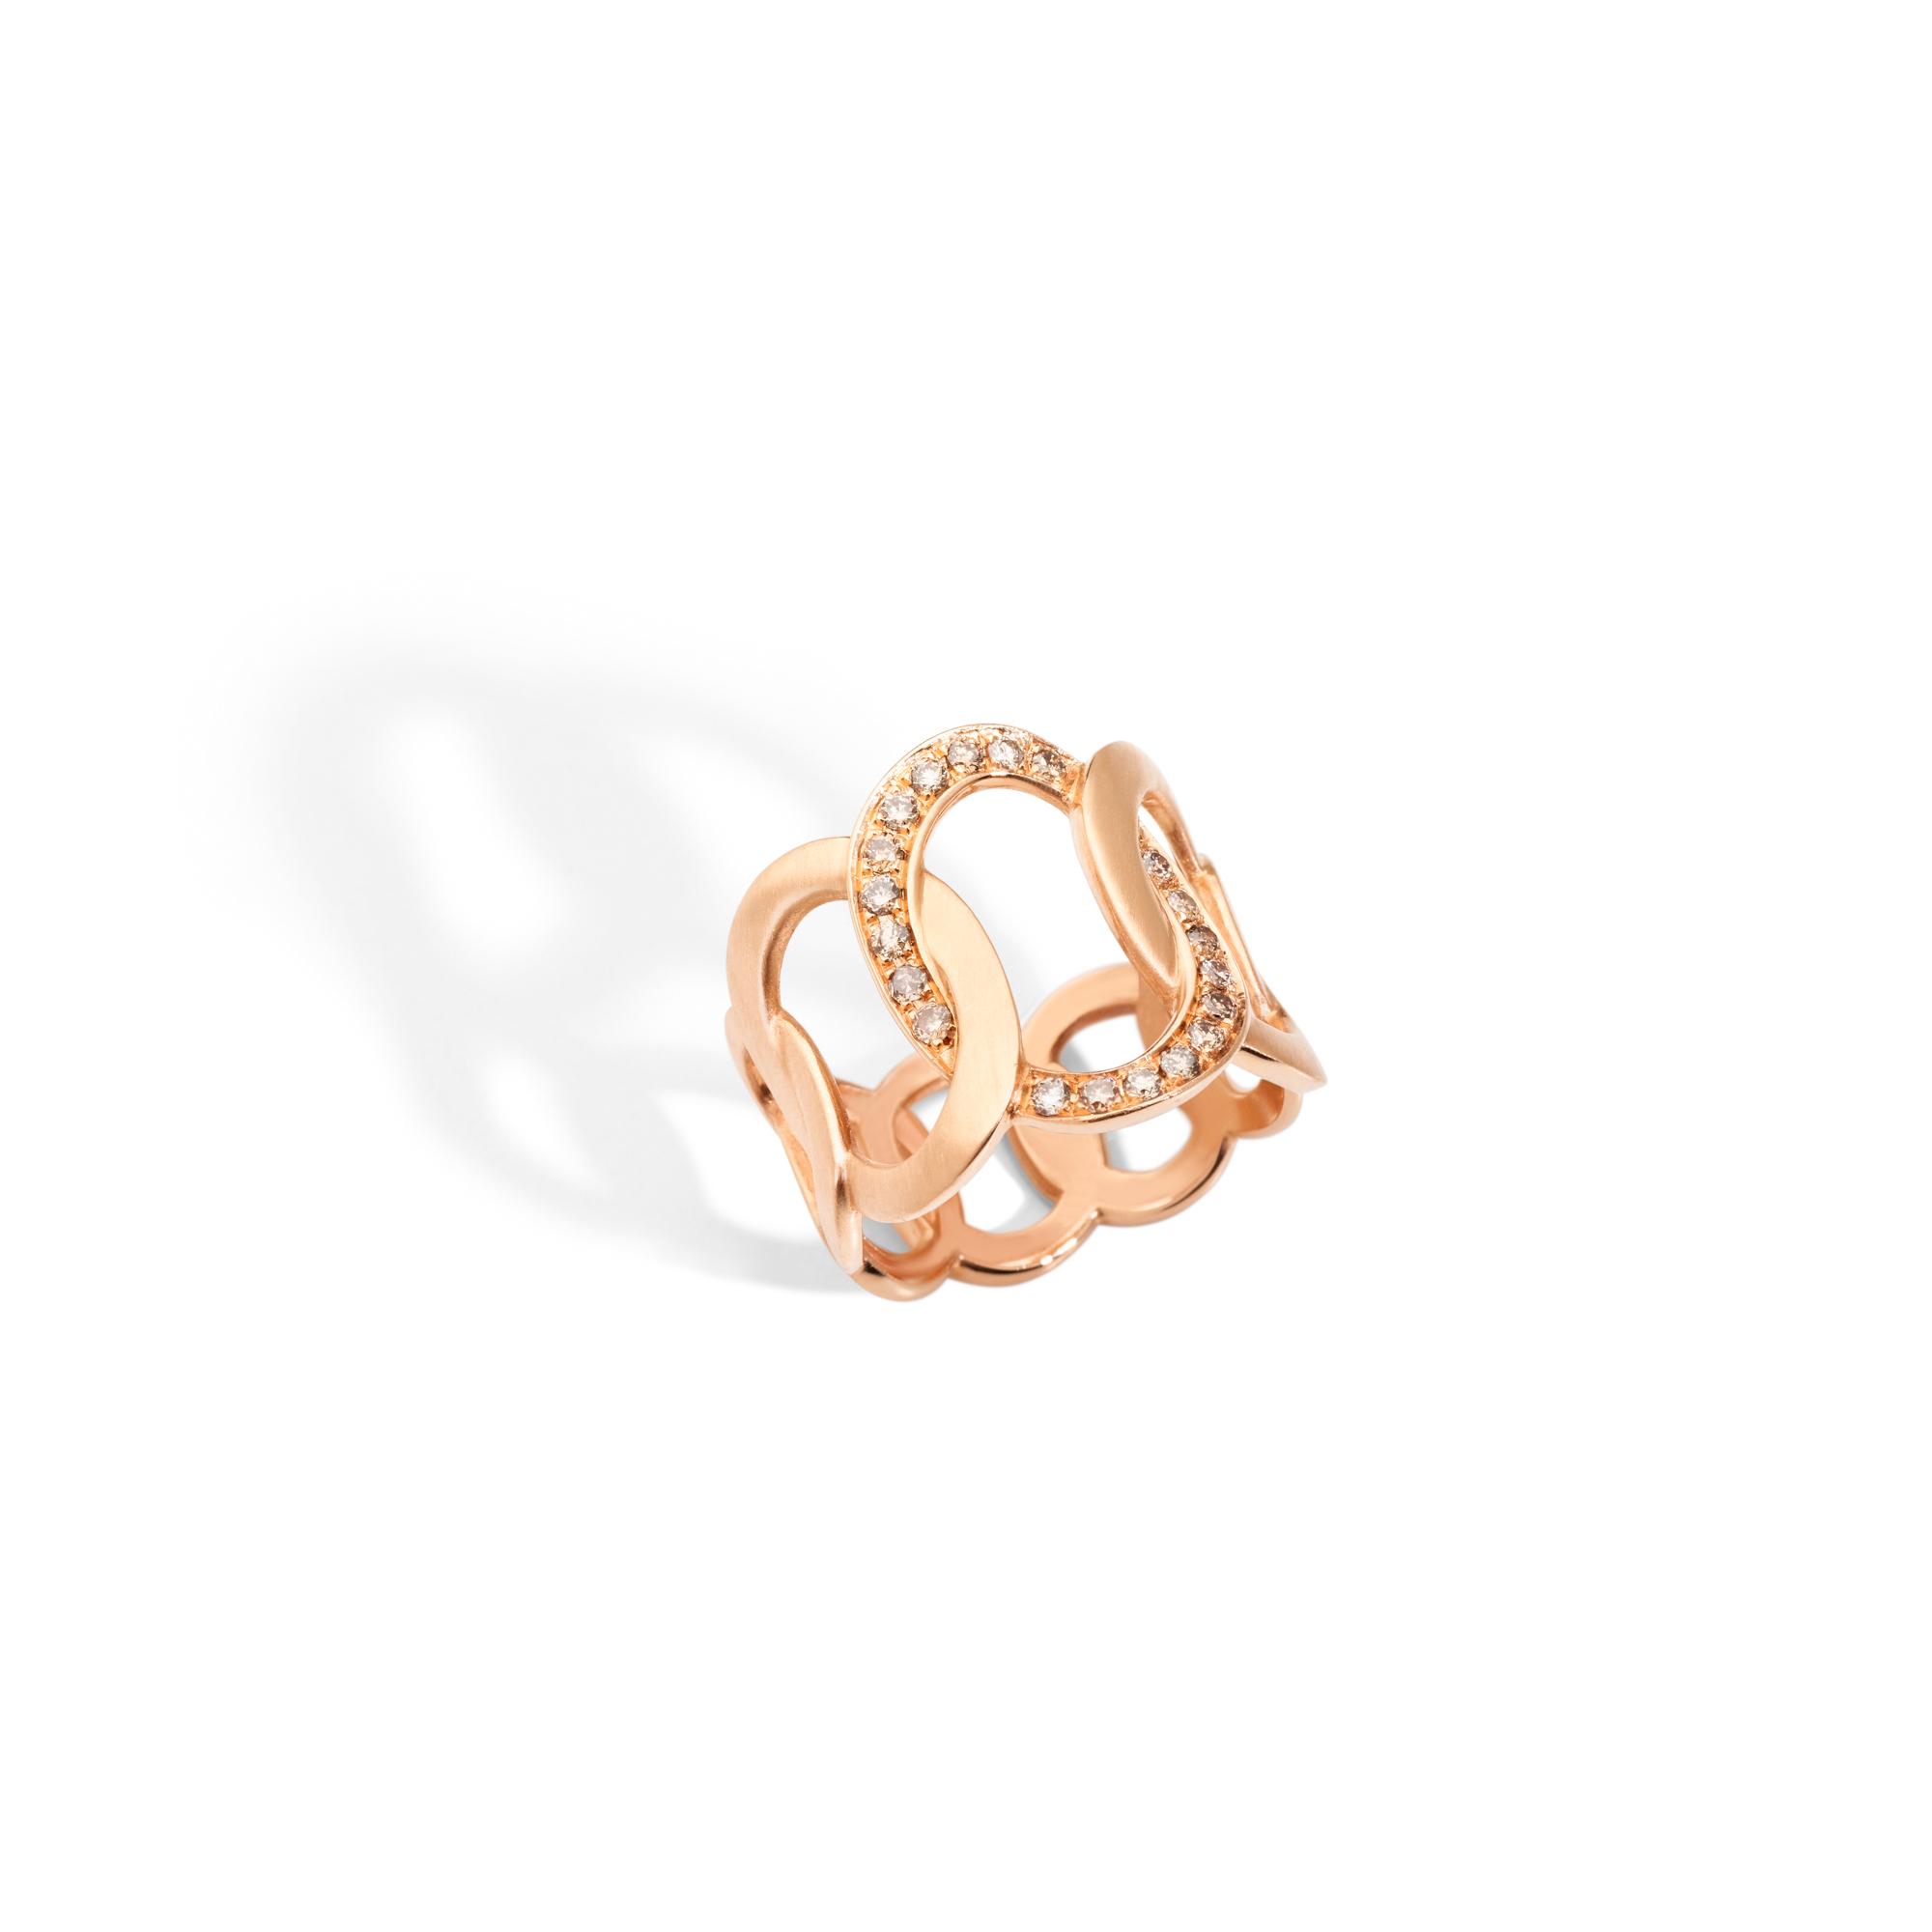 Pomellato Brera Ring aus Roségold mit Brillanten